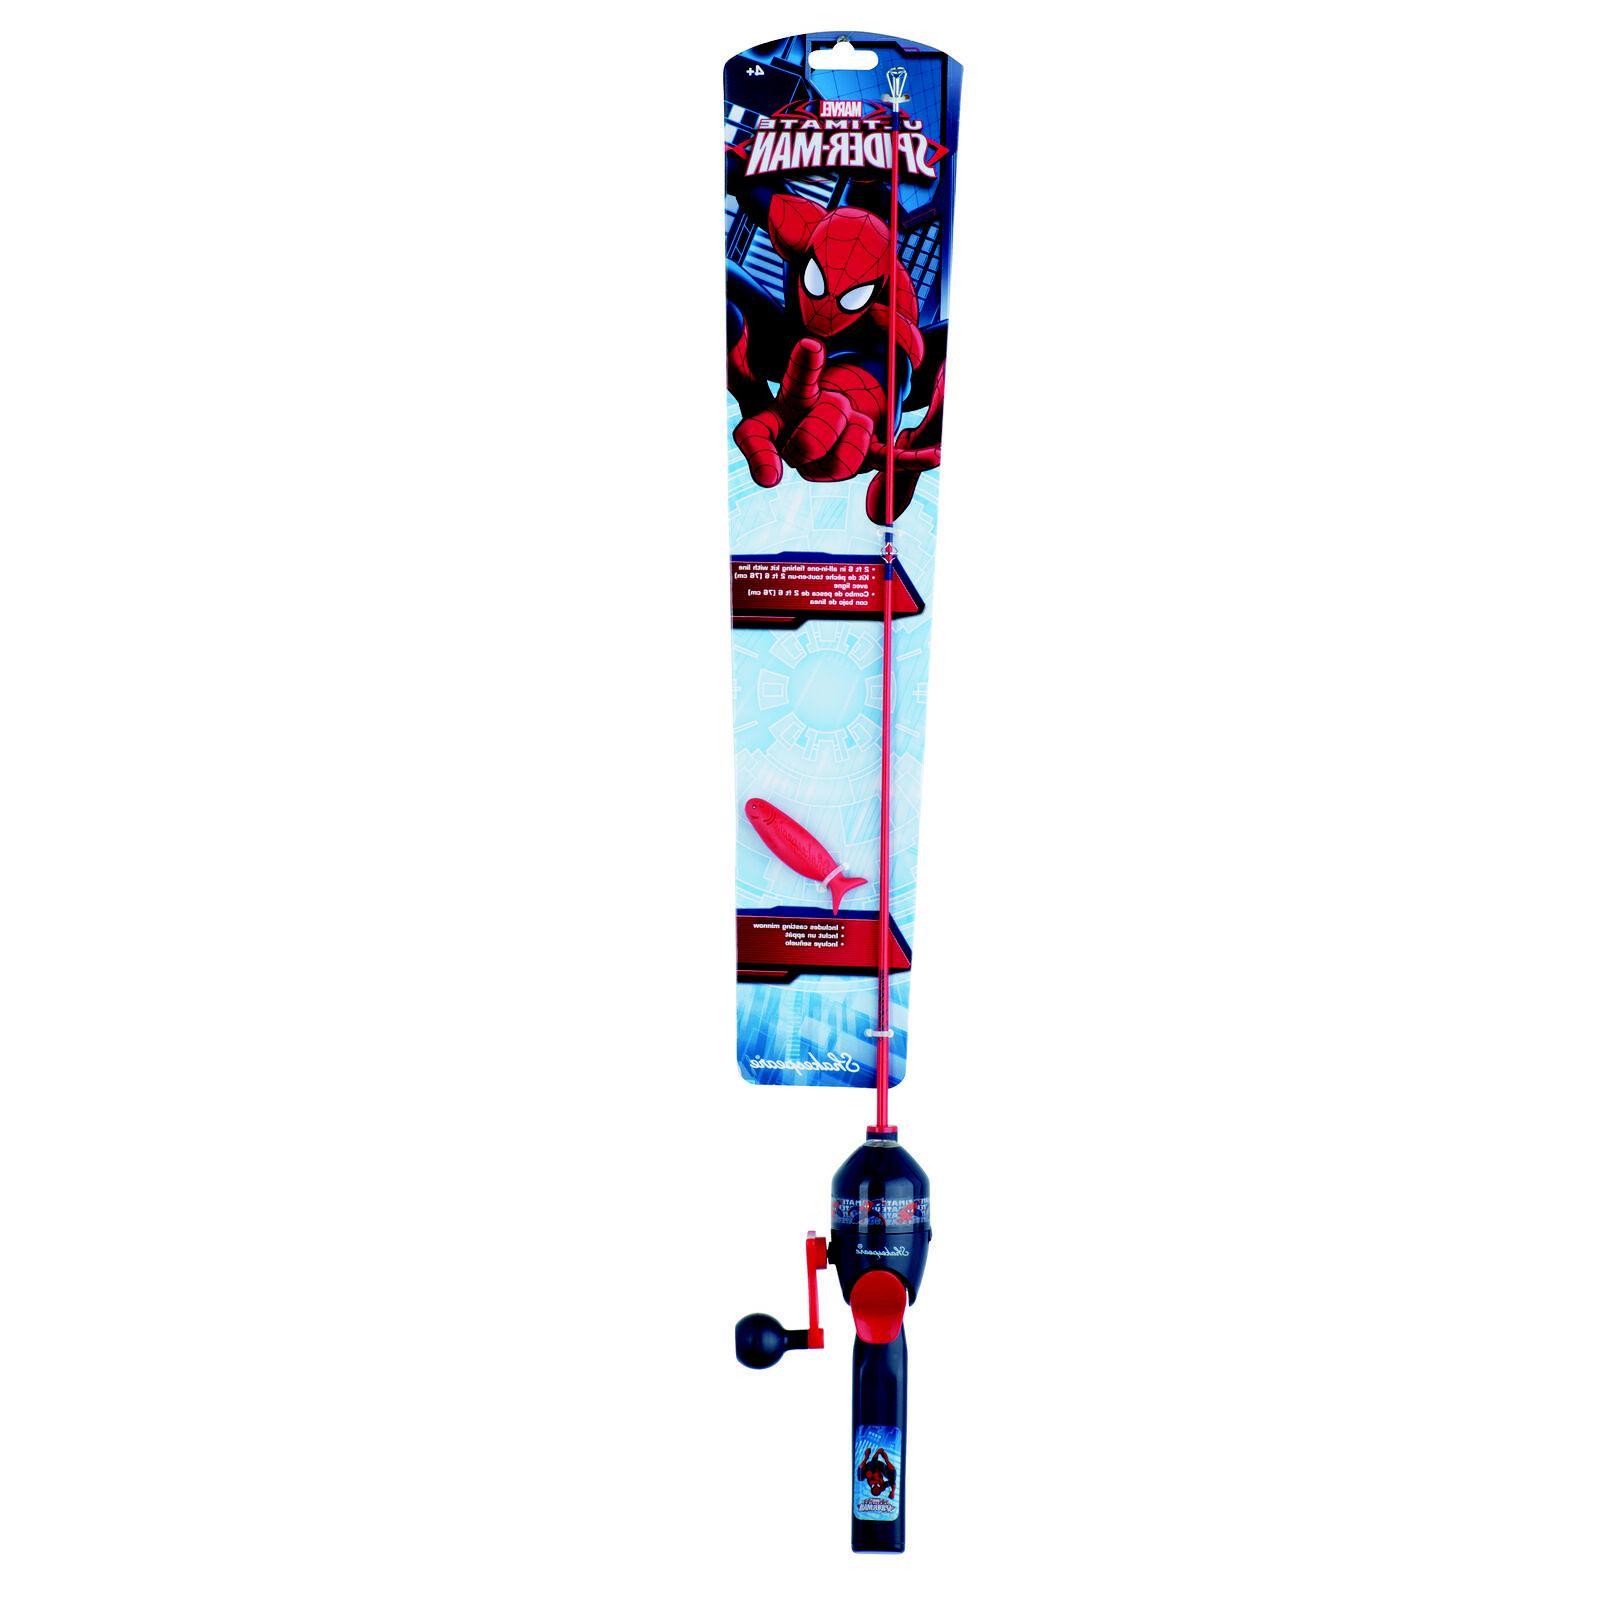 spiderman fishing pole kit